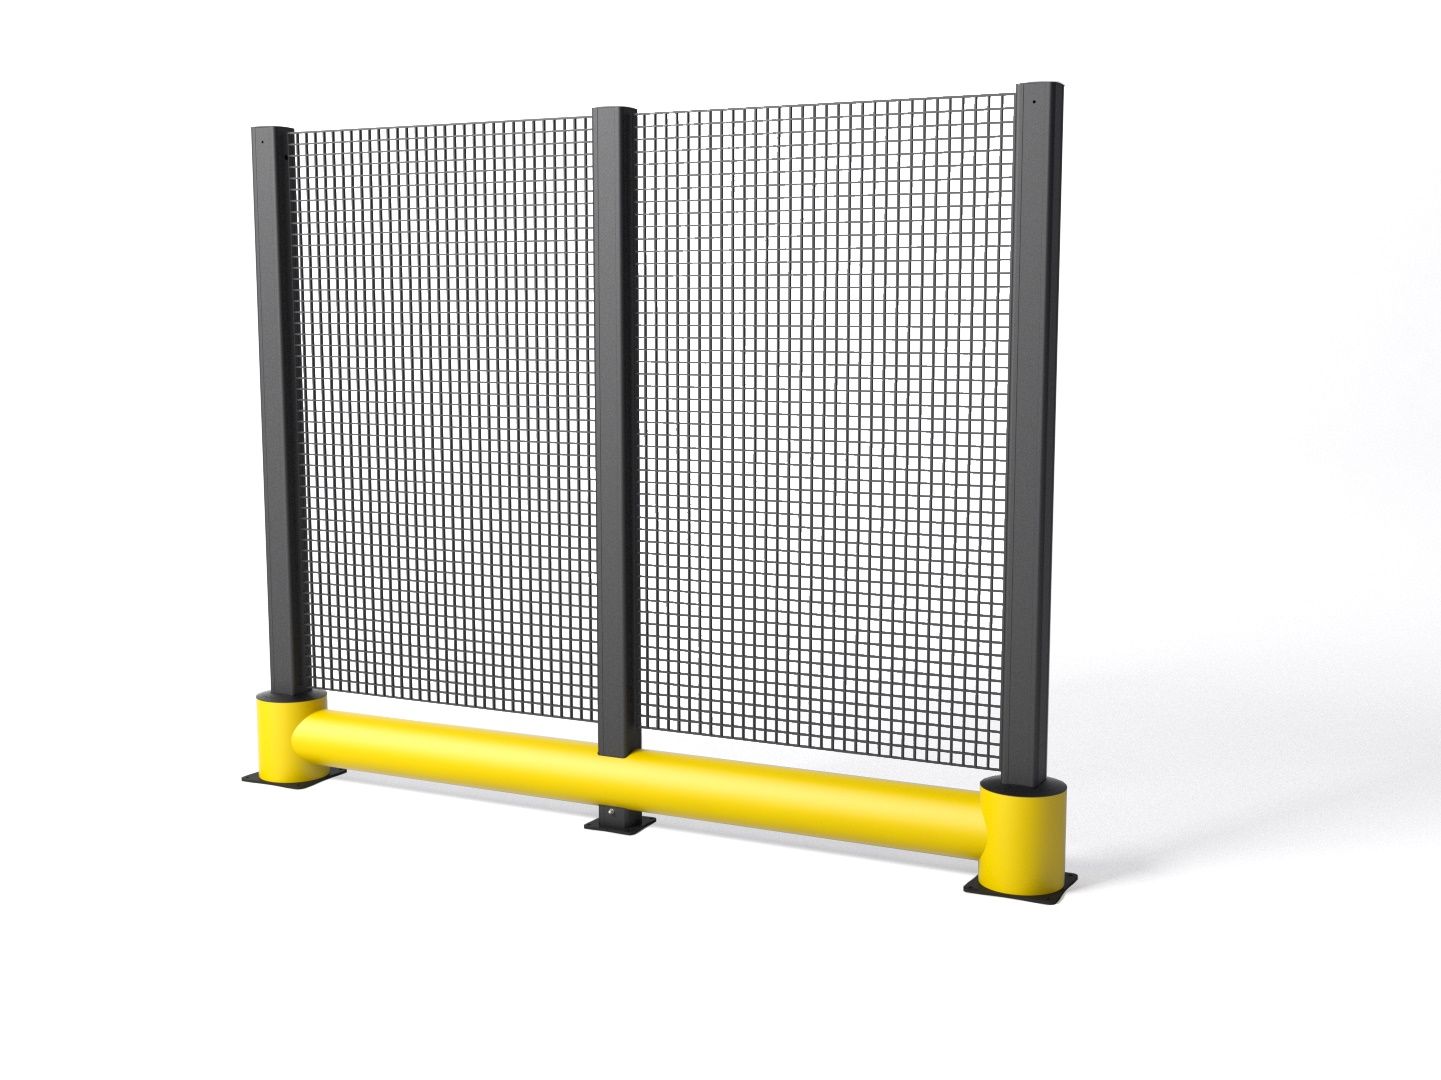 TB 260 Plus Fence